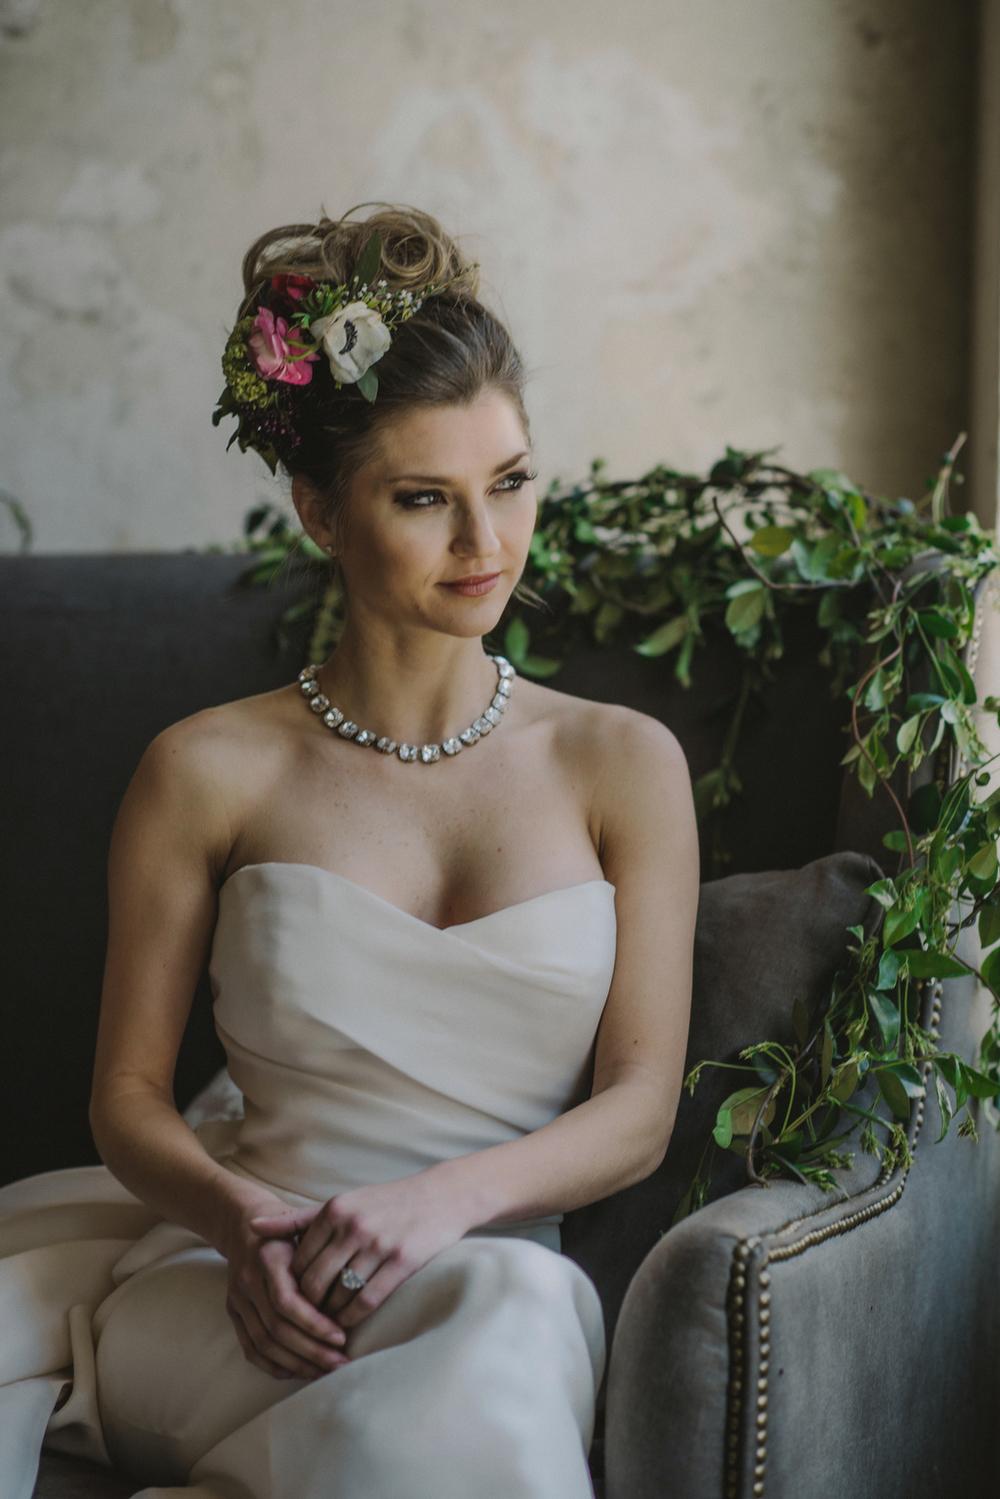 Hair Piece & Garland Bride- Maxit Flowers- Houston Events